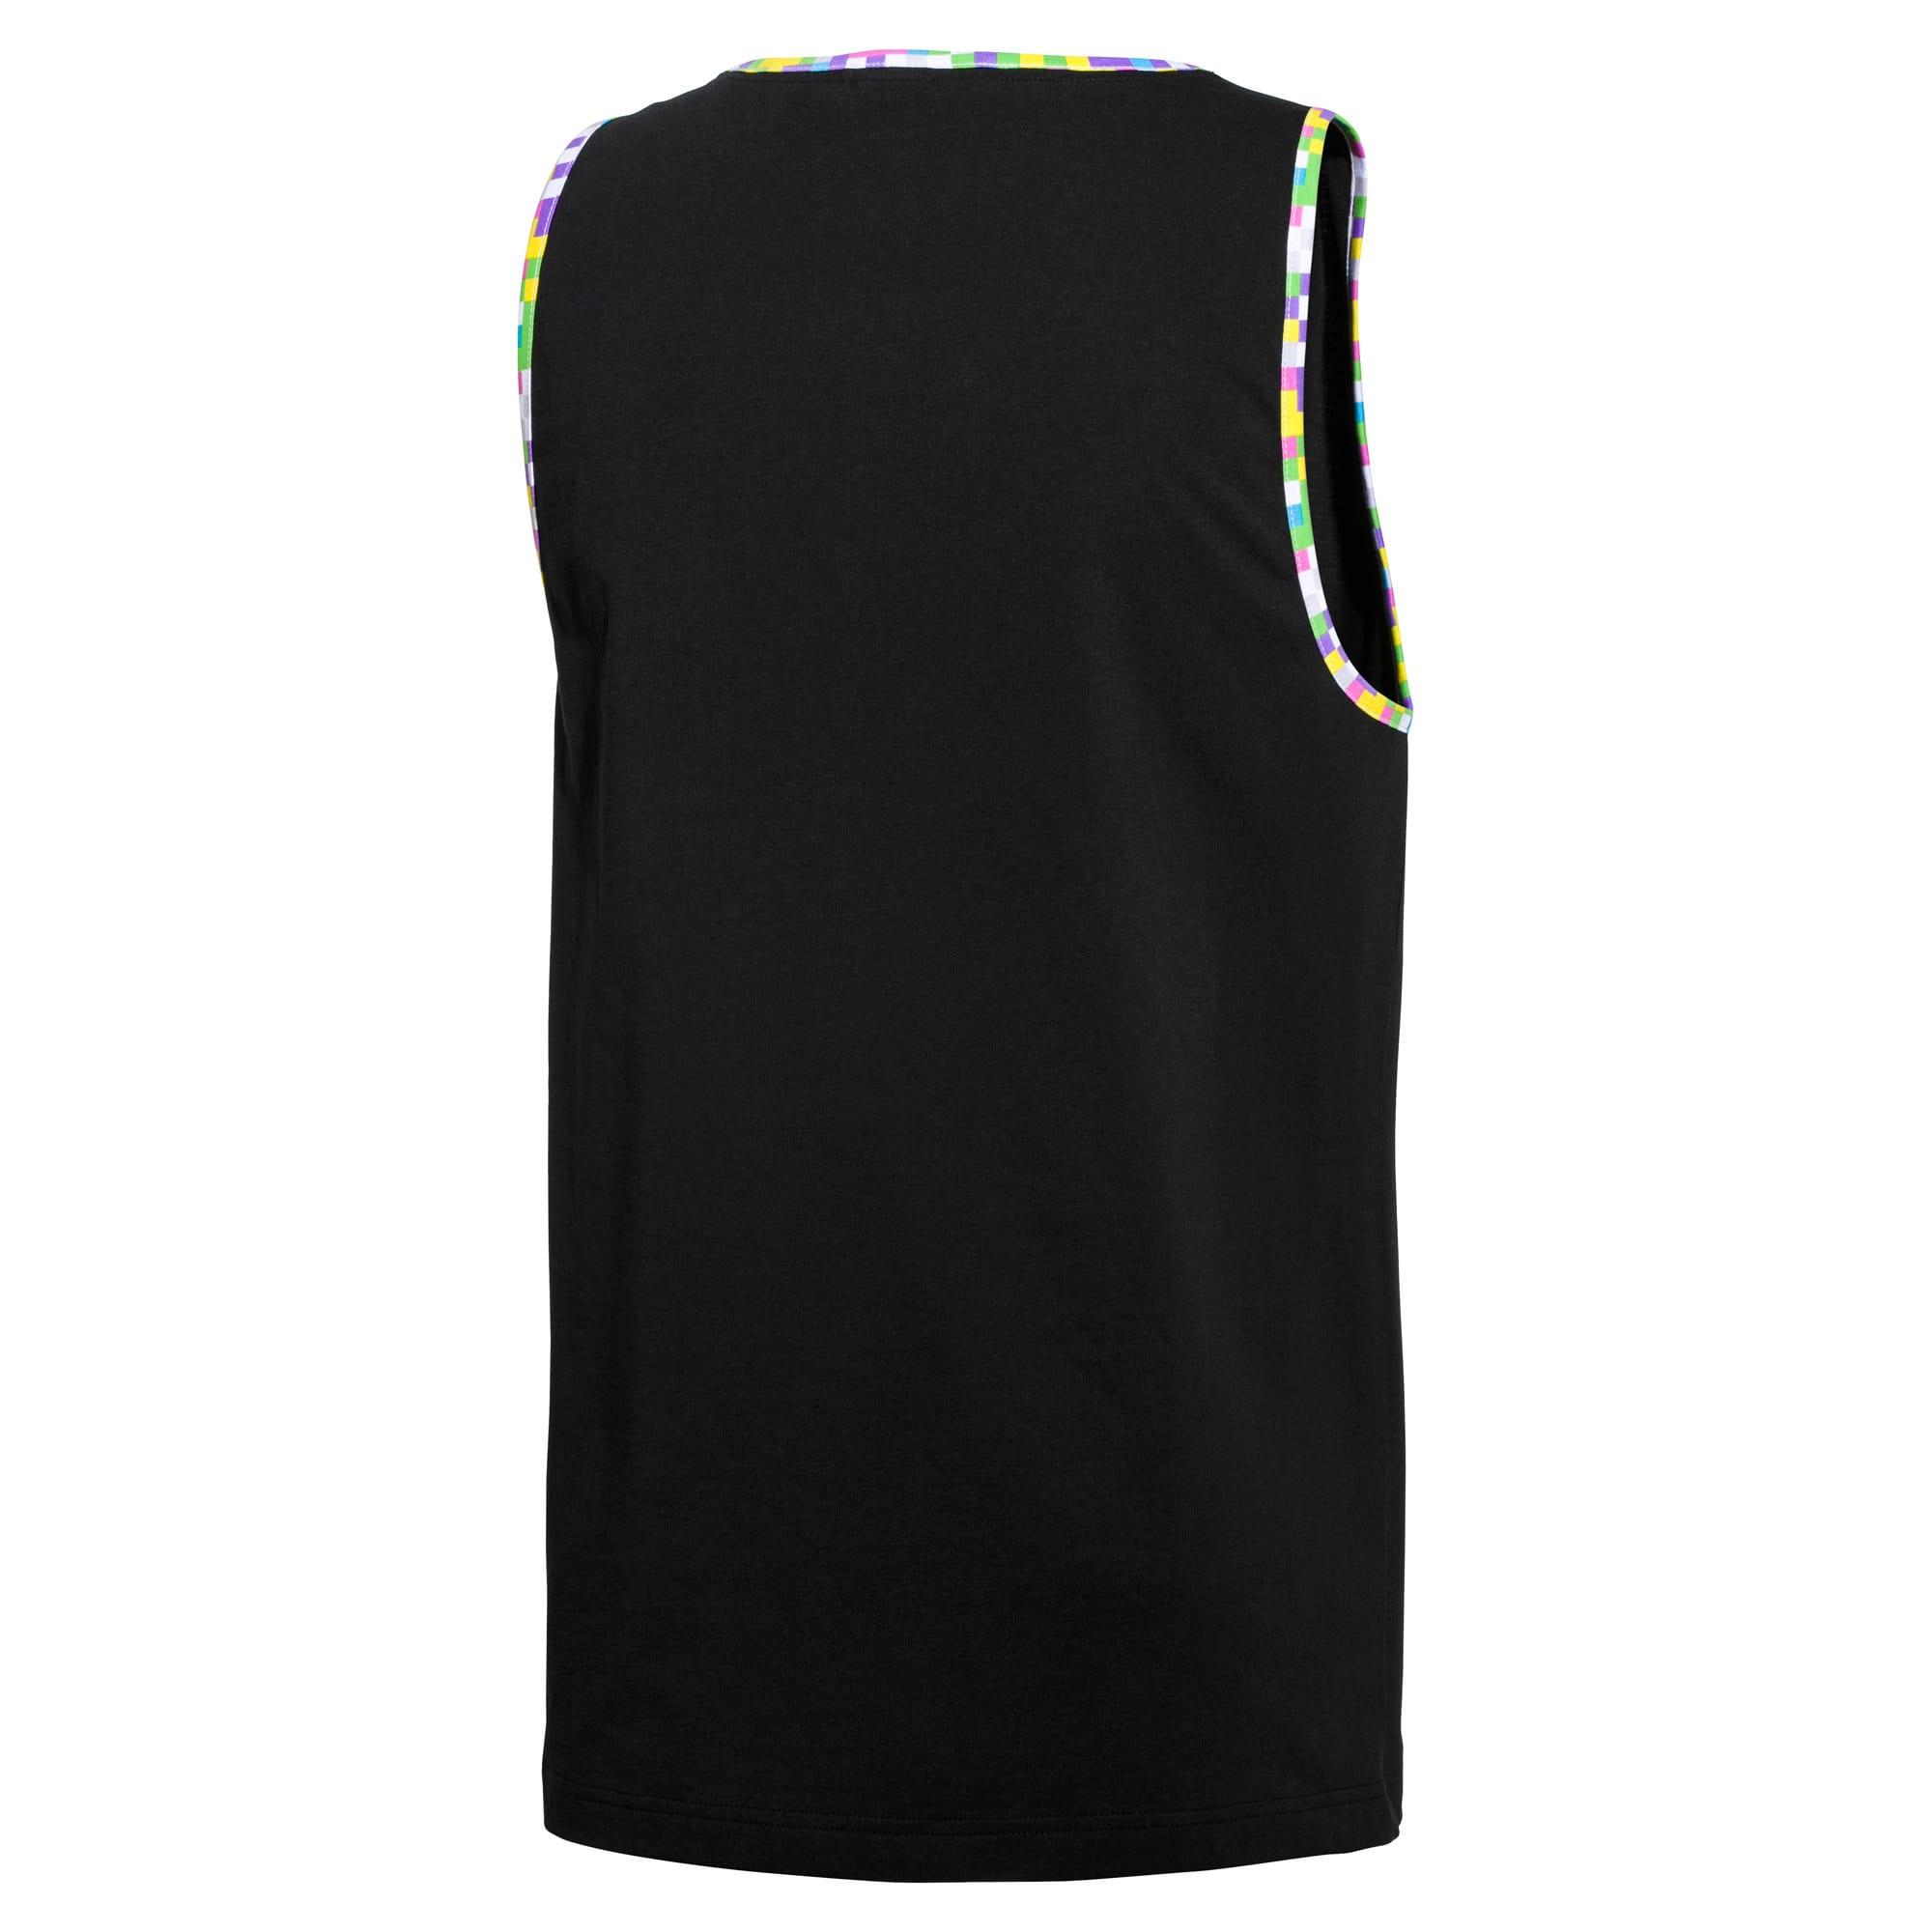 Miniatura 2 de Camiseta sin mangas PUMA x MTV para hombre, Puma Black, mediano